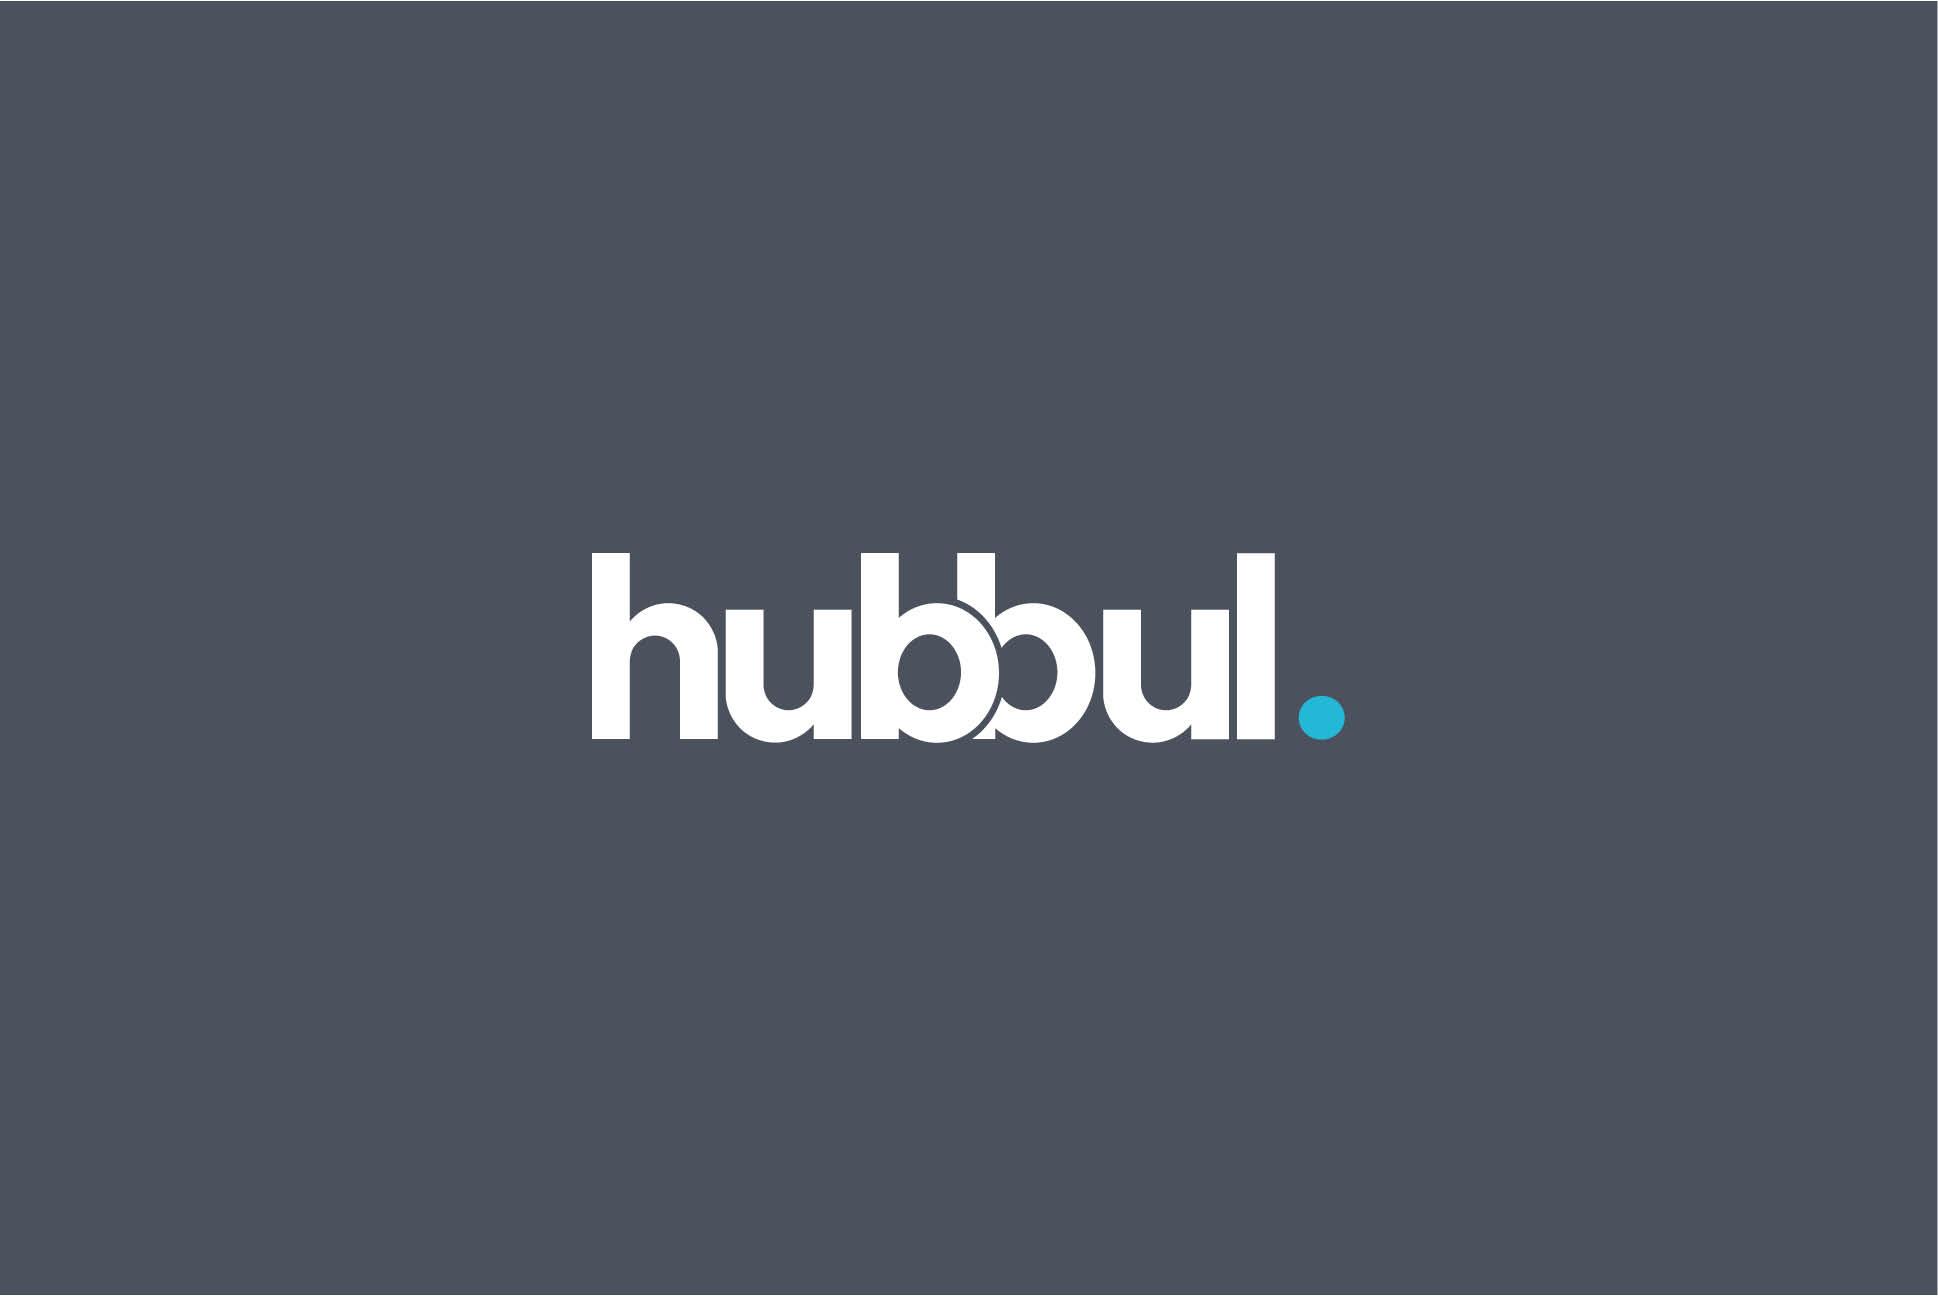 hubbul logo